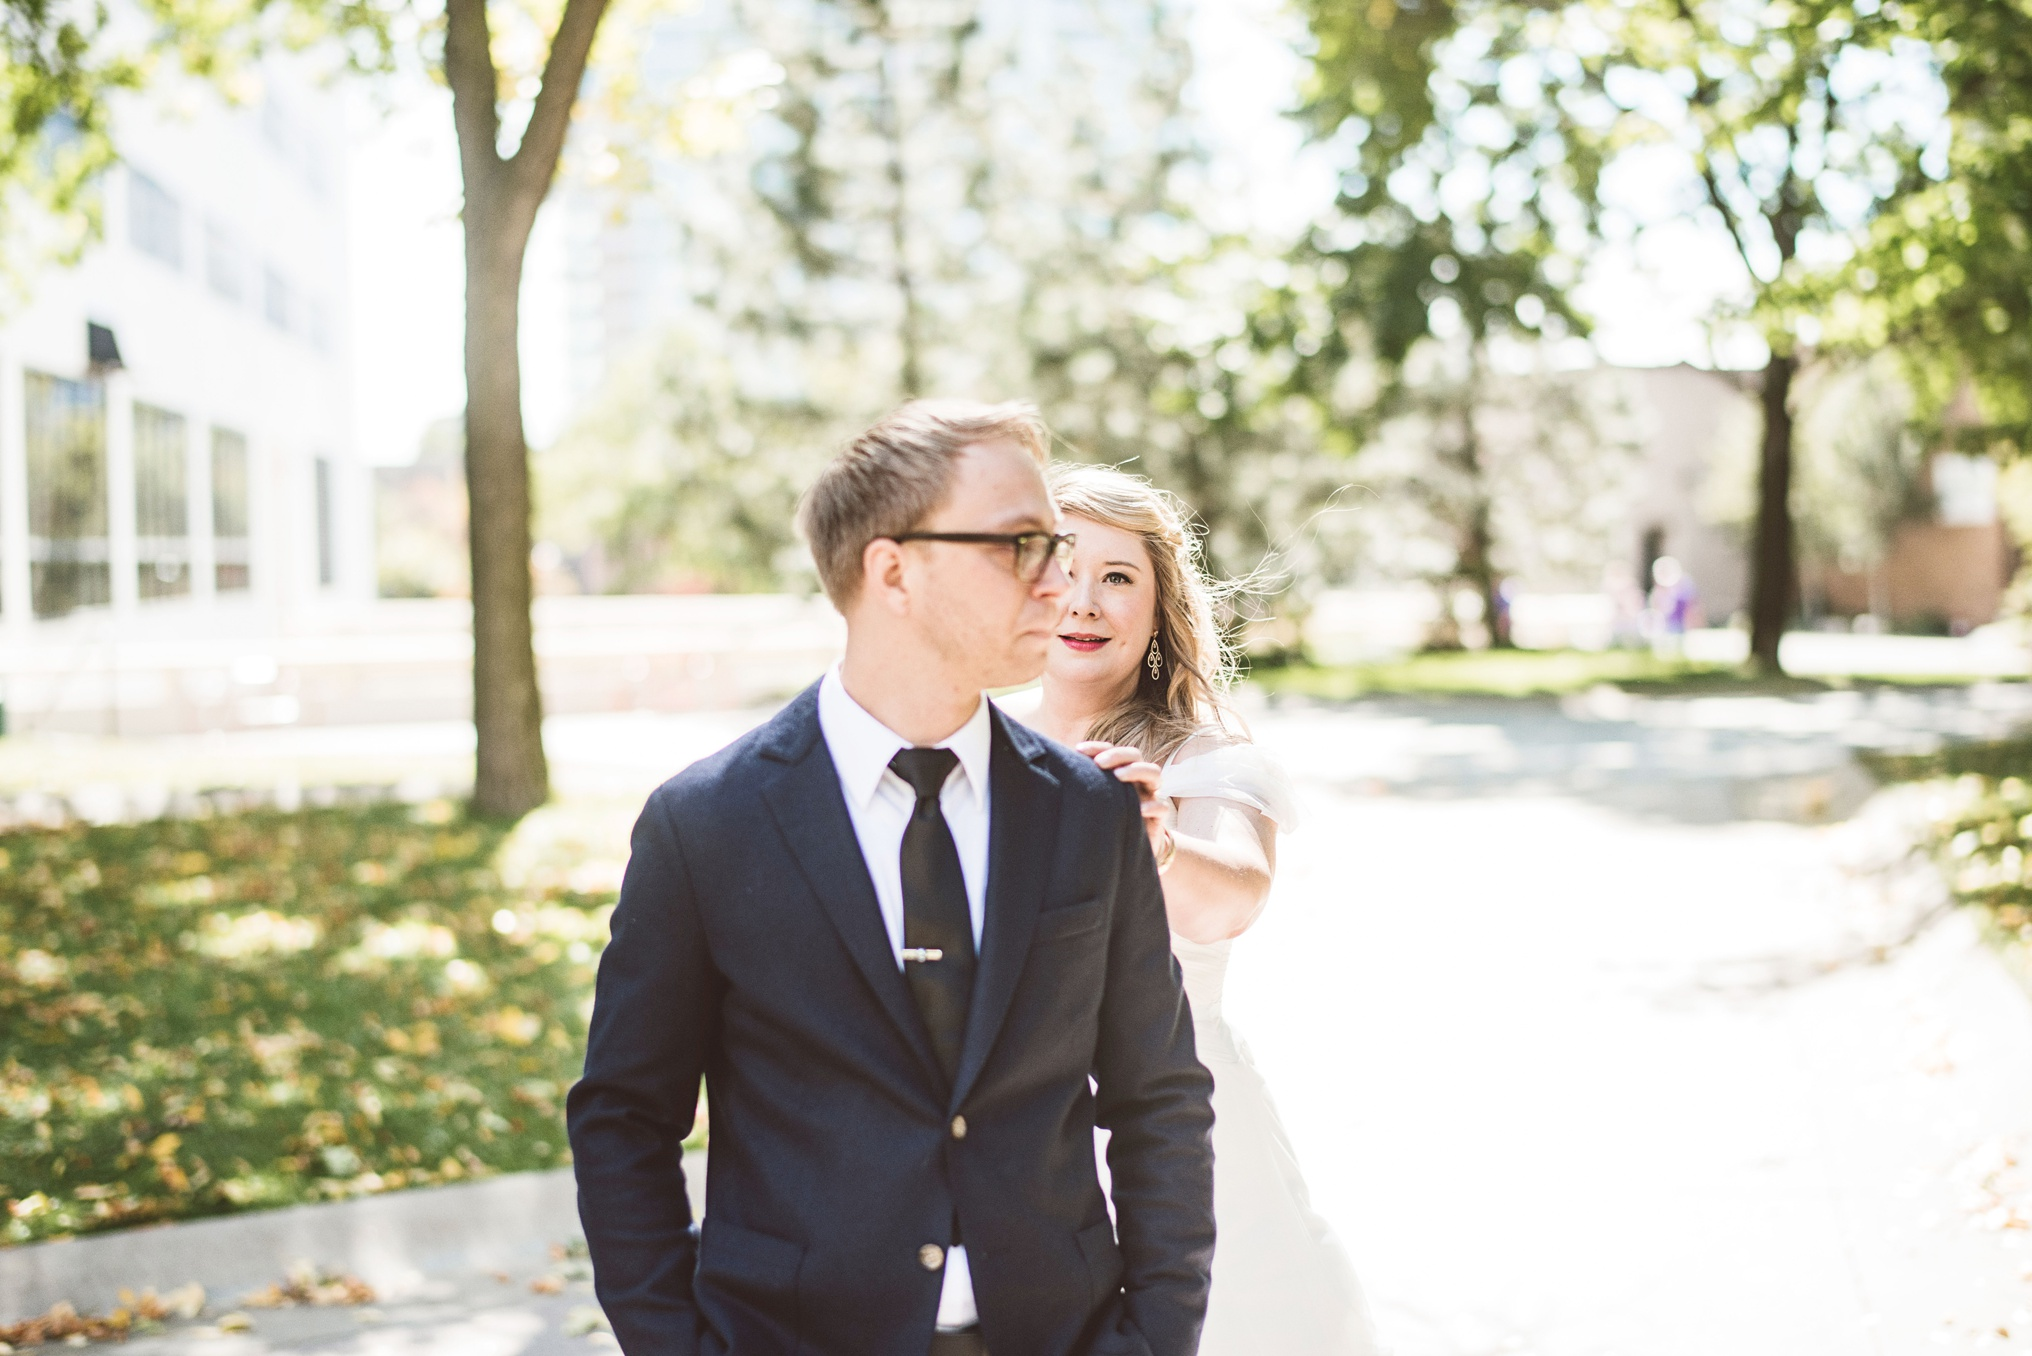 best_wedding_photography_2017_by_lucas_botz_photography_224.jpg